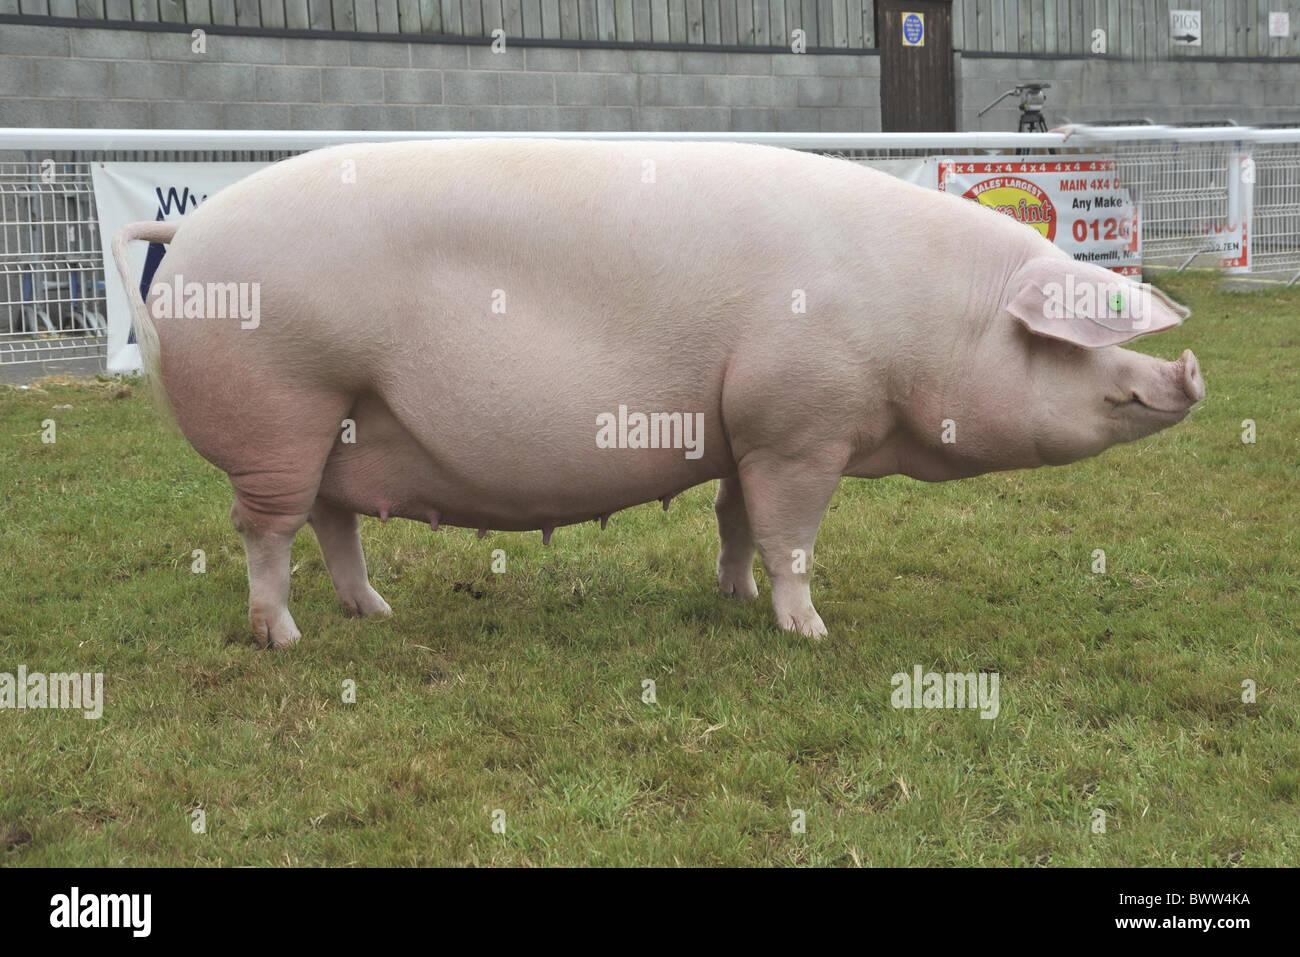 Pig of pigs